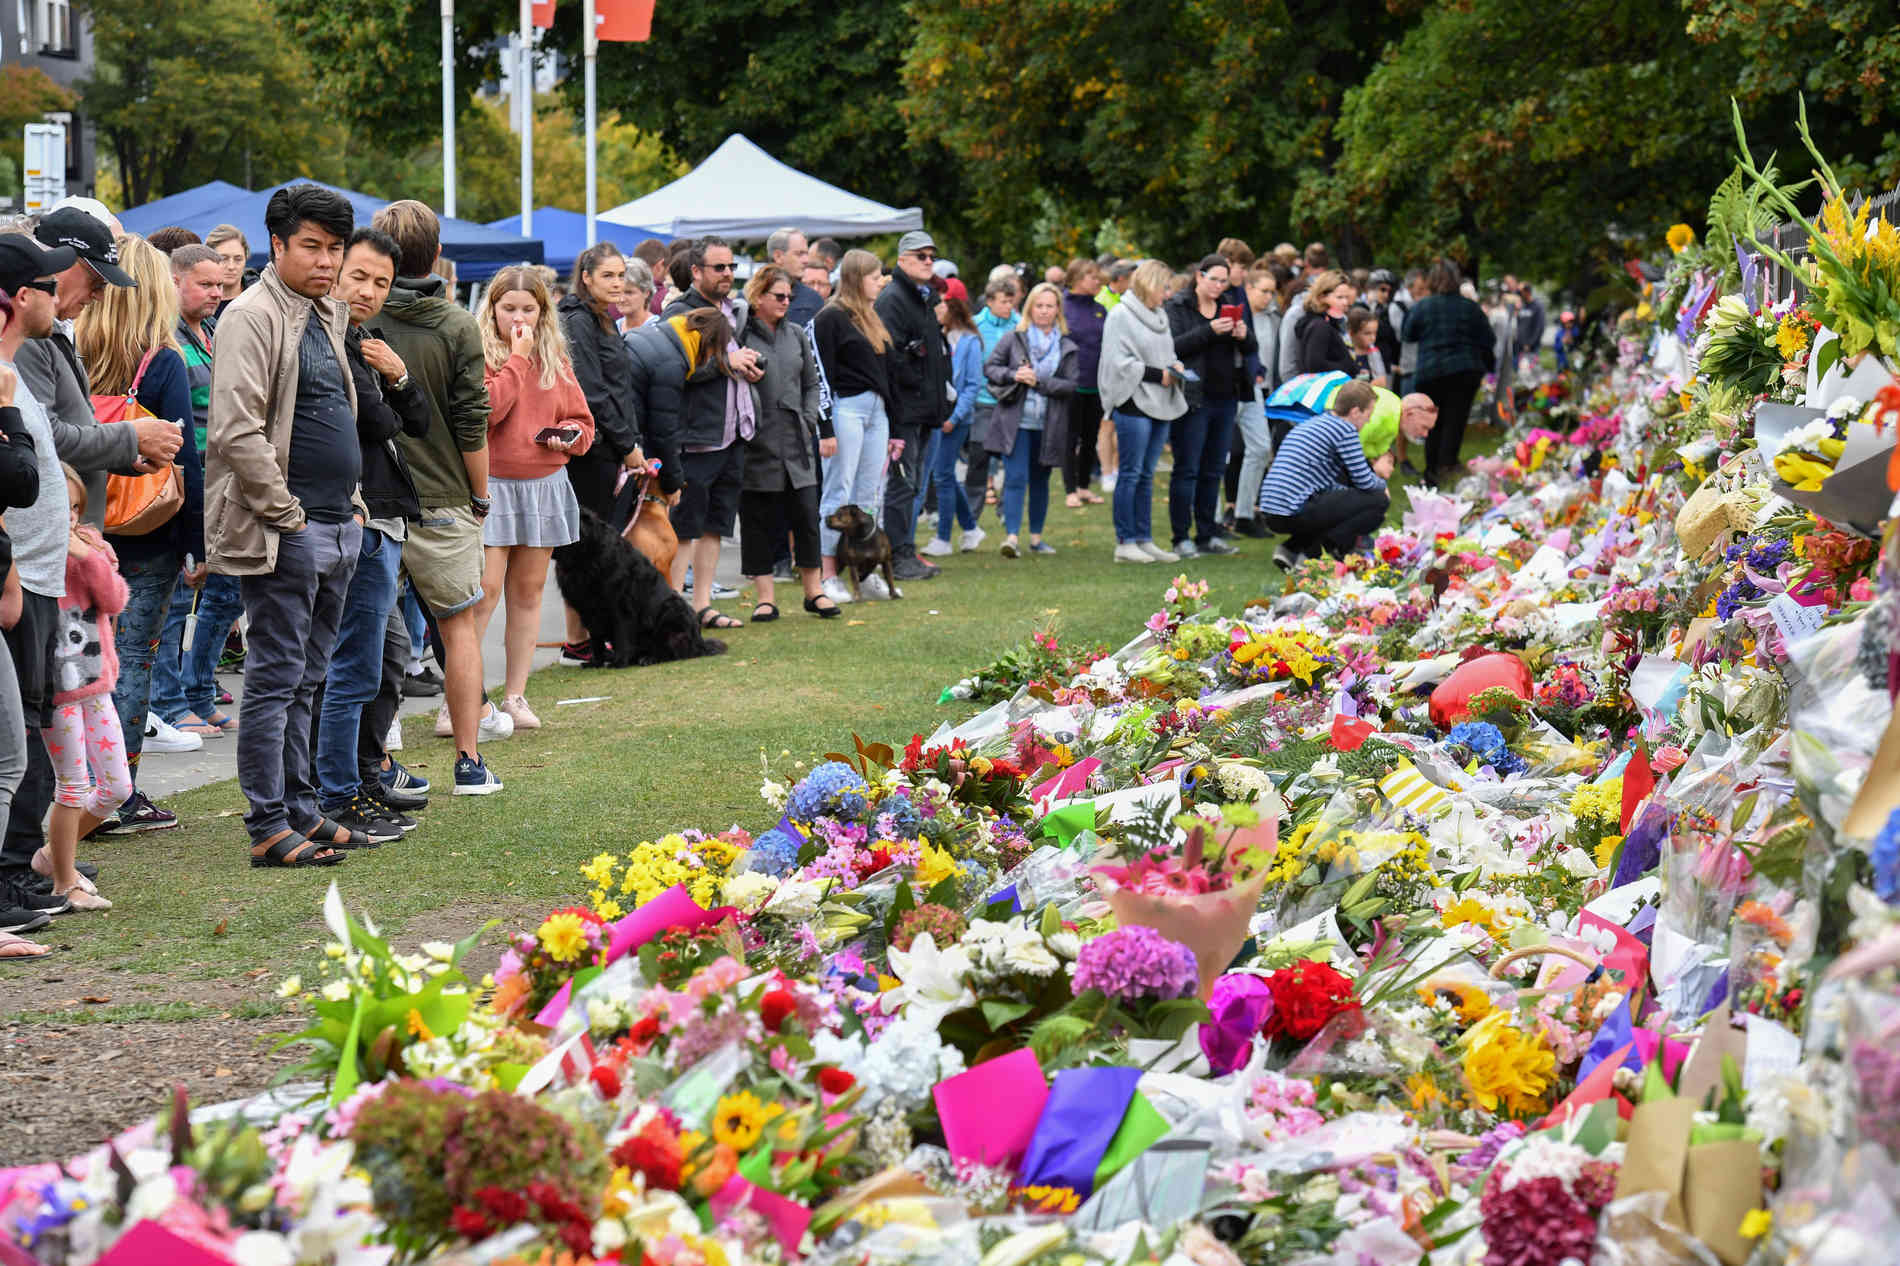 Attentat In Christchurch: Neuseeland Trauert Um 50 Todesopfer